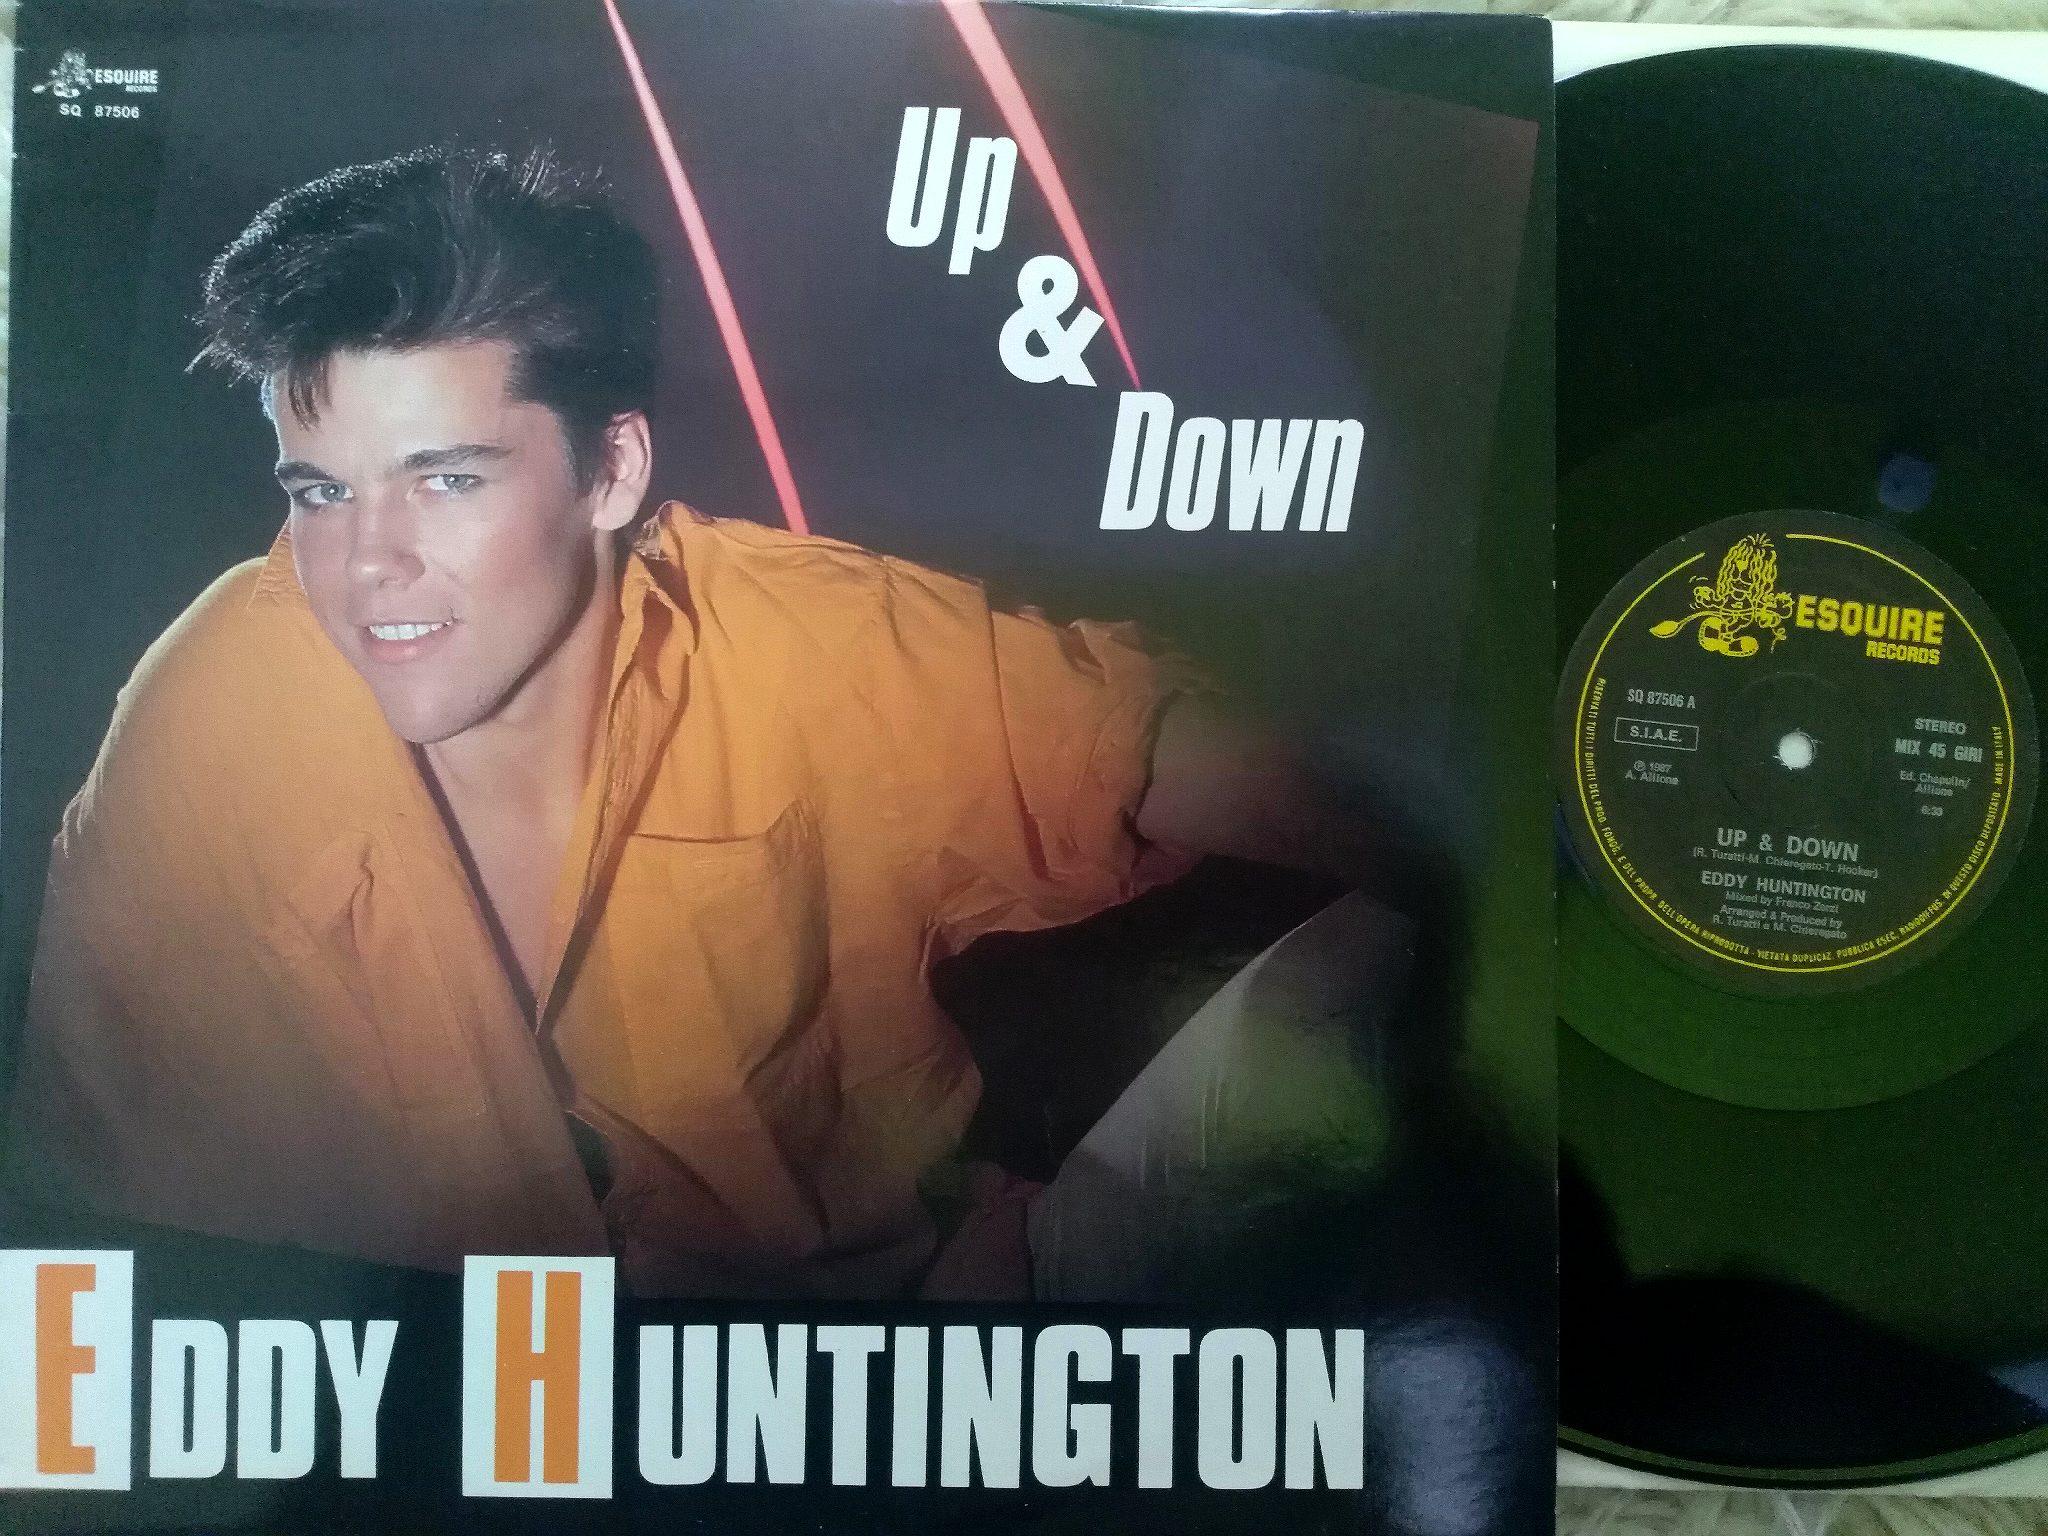 Eddy Huntington - Up & down